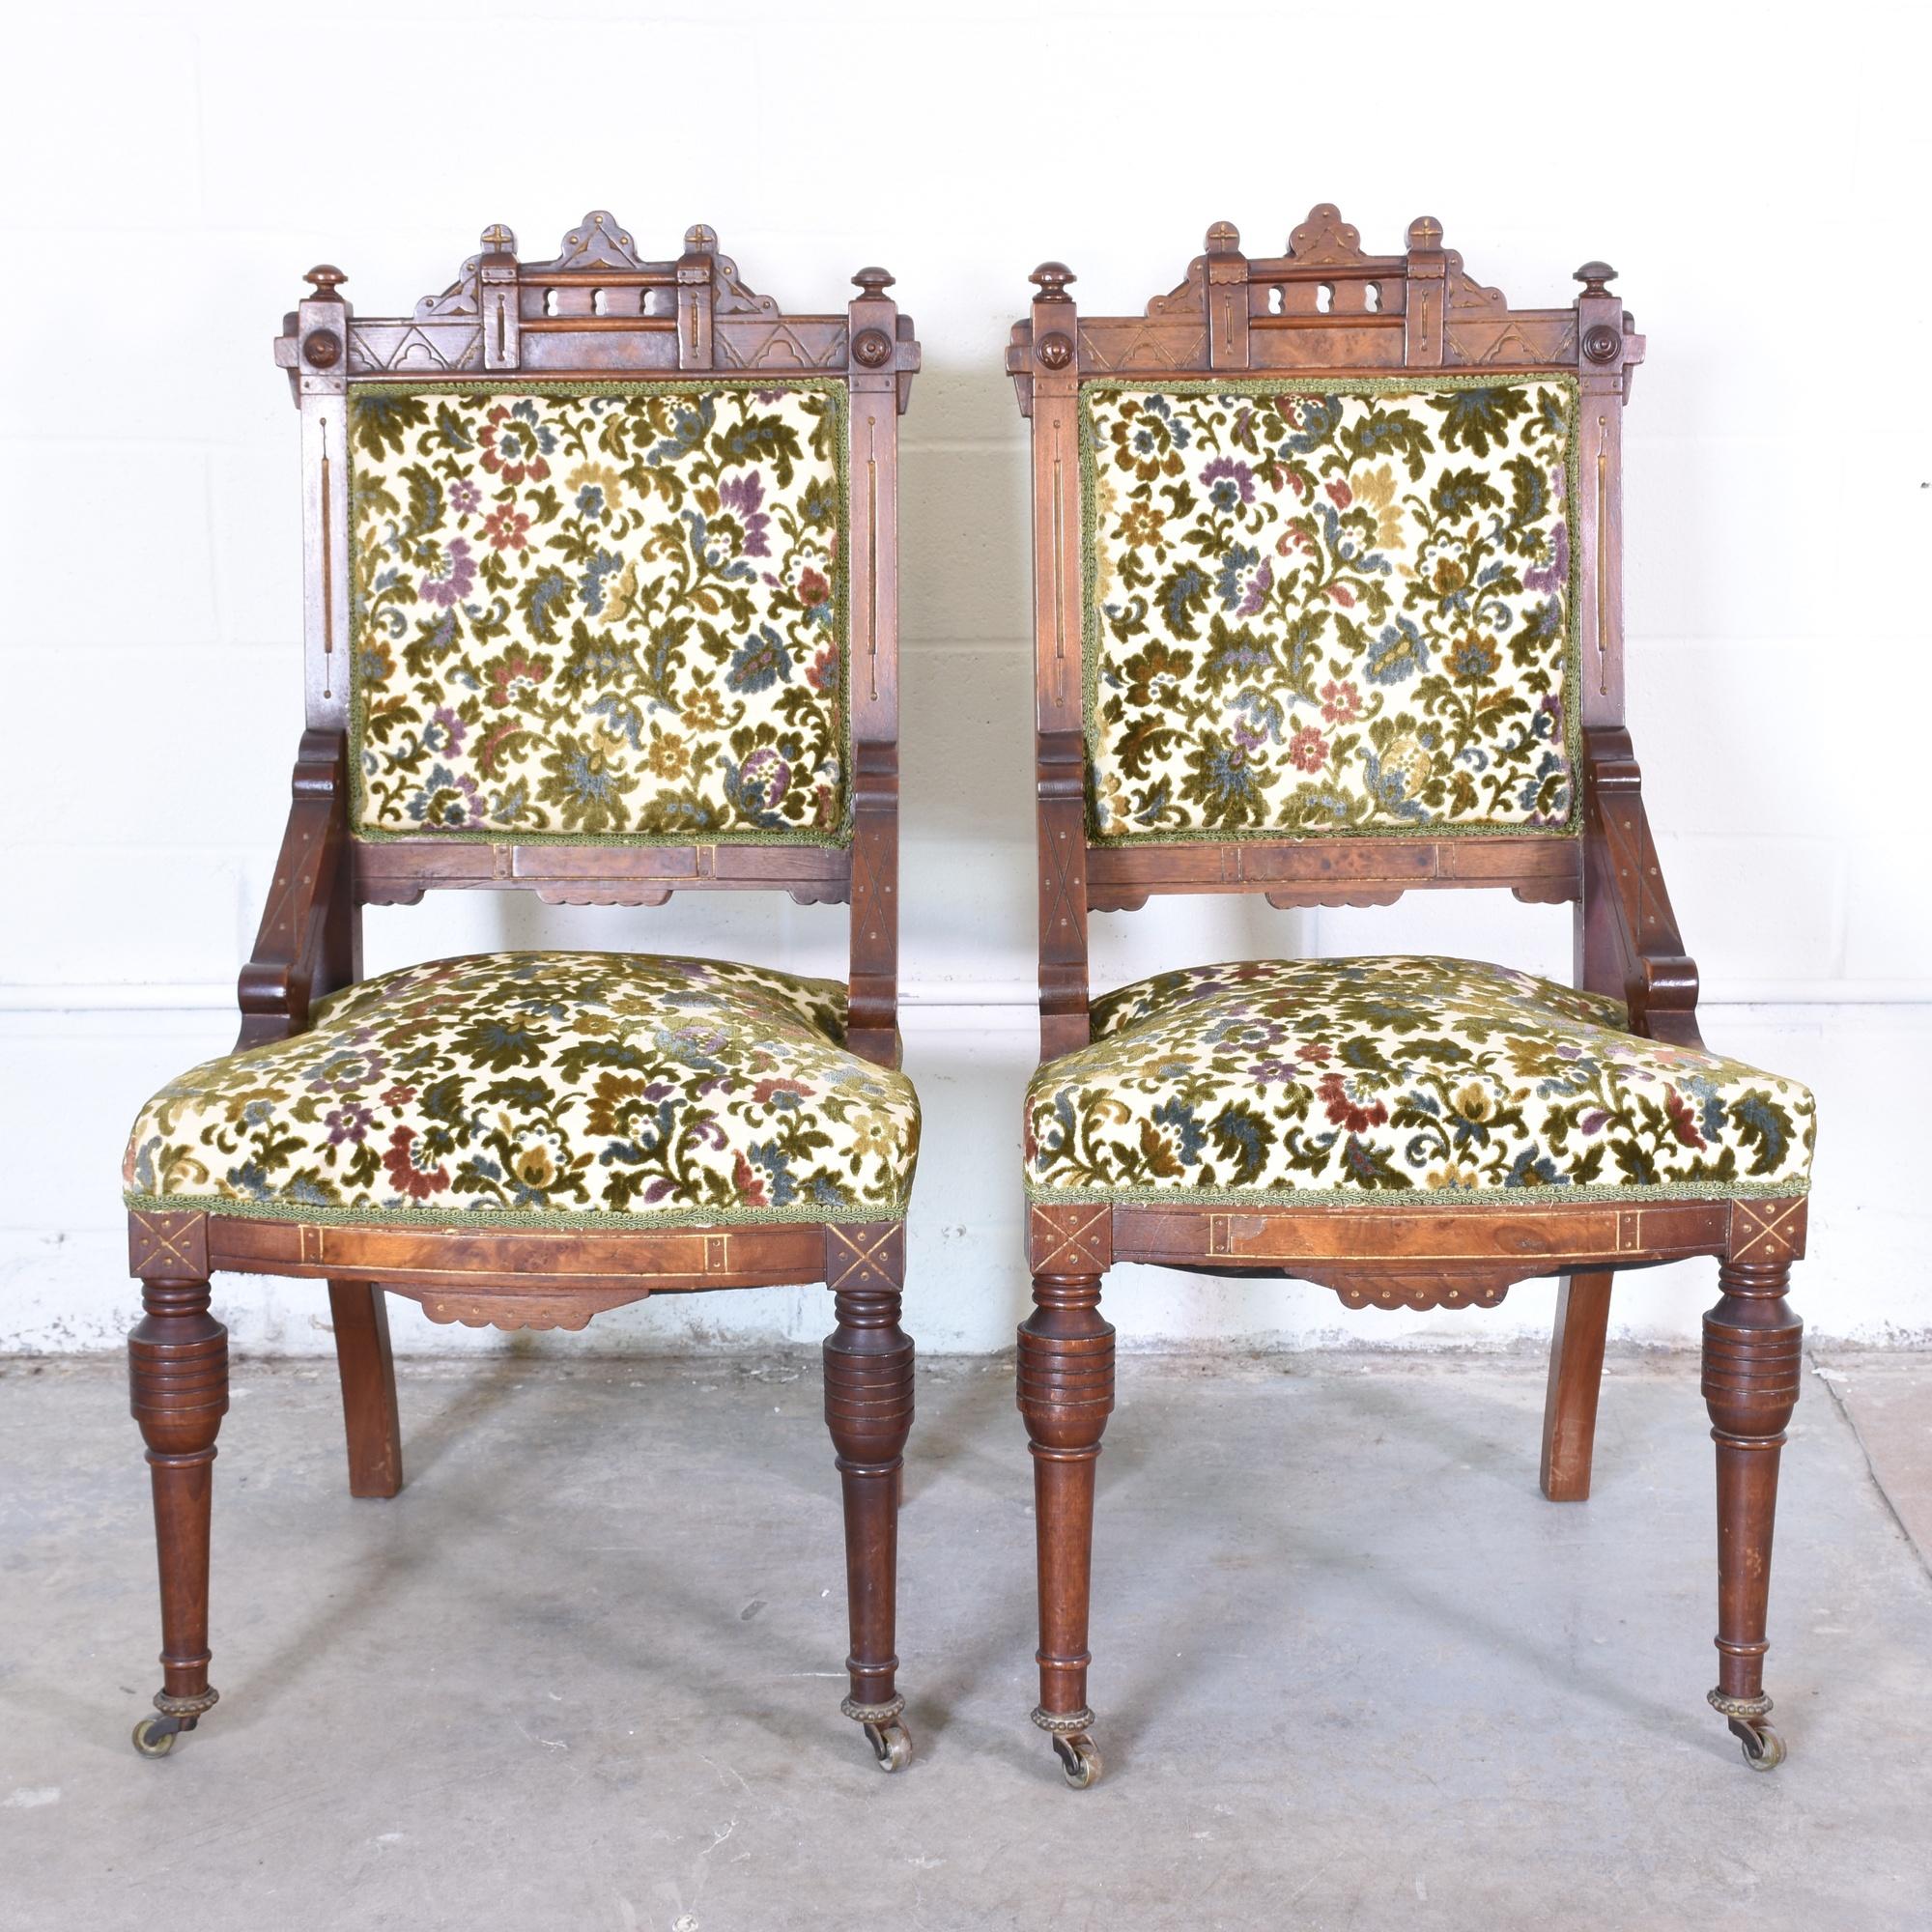 Pair Of Eastlake Chairs In Floral Upholstery Loveseat Vintage - Furniture upholstery san diego